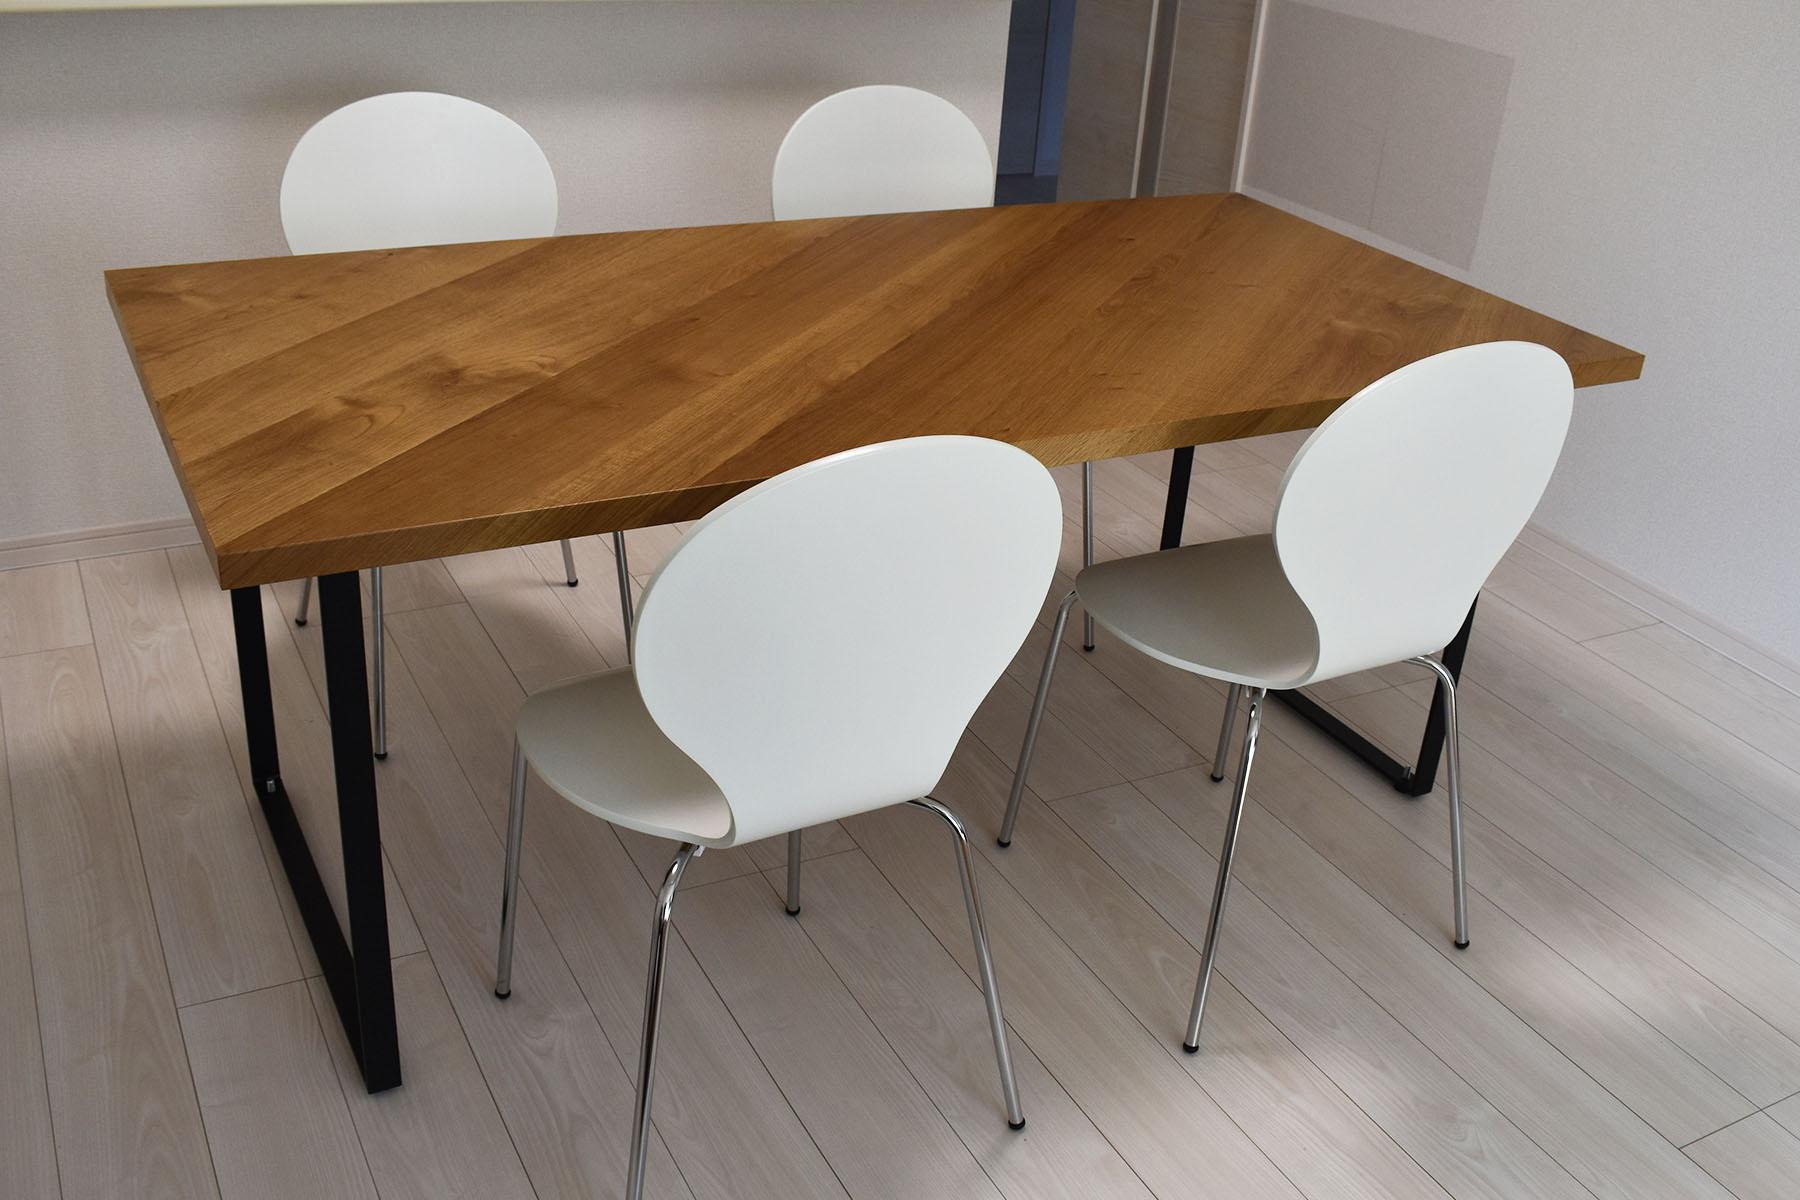 TABLE TOP XL45 NARA KNOTTY